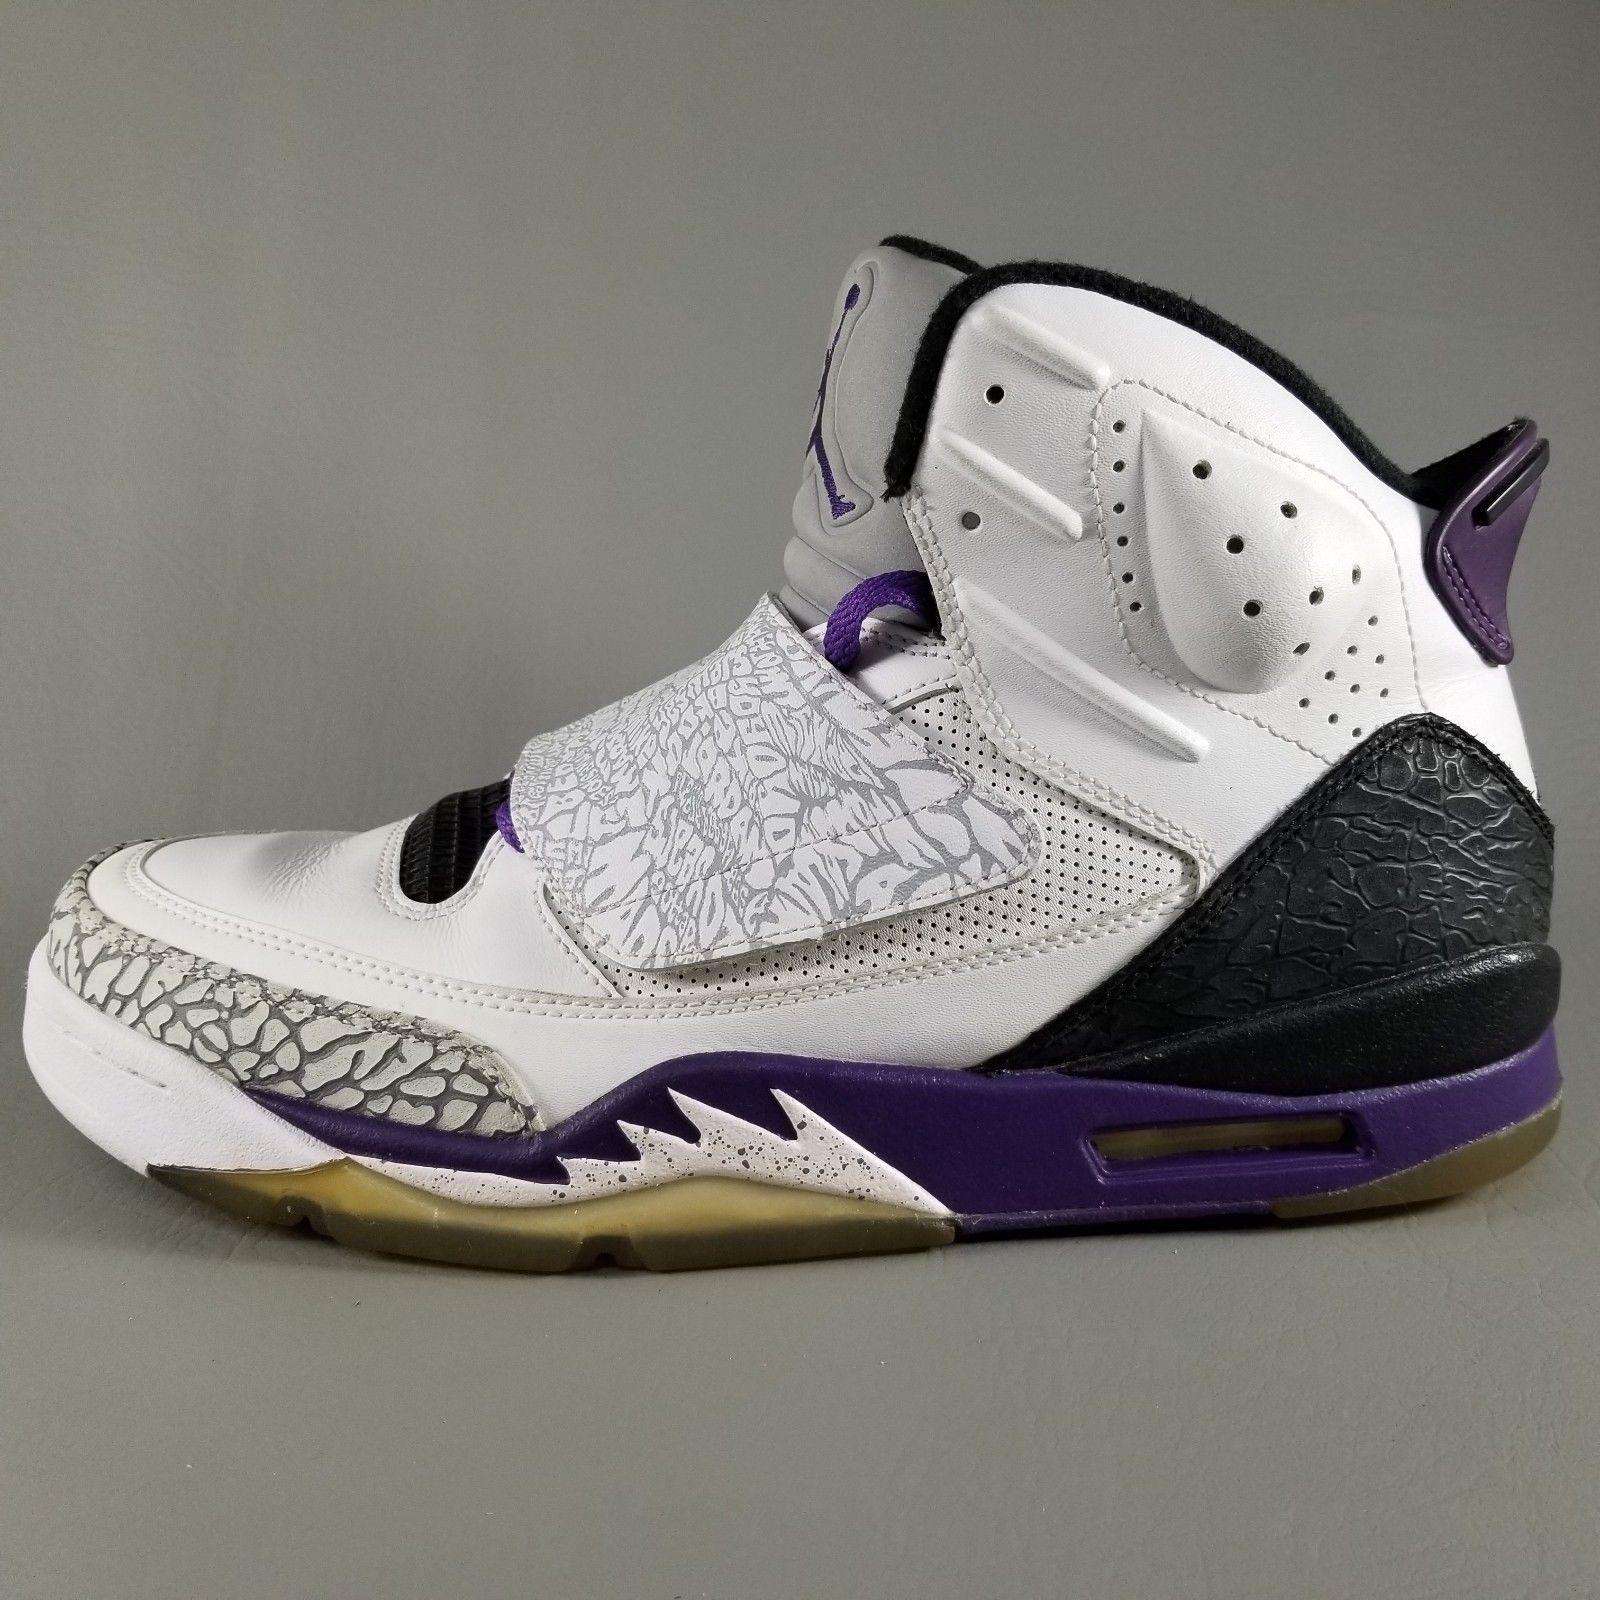 the best attitude 60e0b 3884b 57. 57. Previous. Nike Air Jordan Son of Mars Basketball Shoes Size 10 Mens  White Purple Black · Nike Air ...